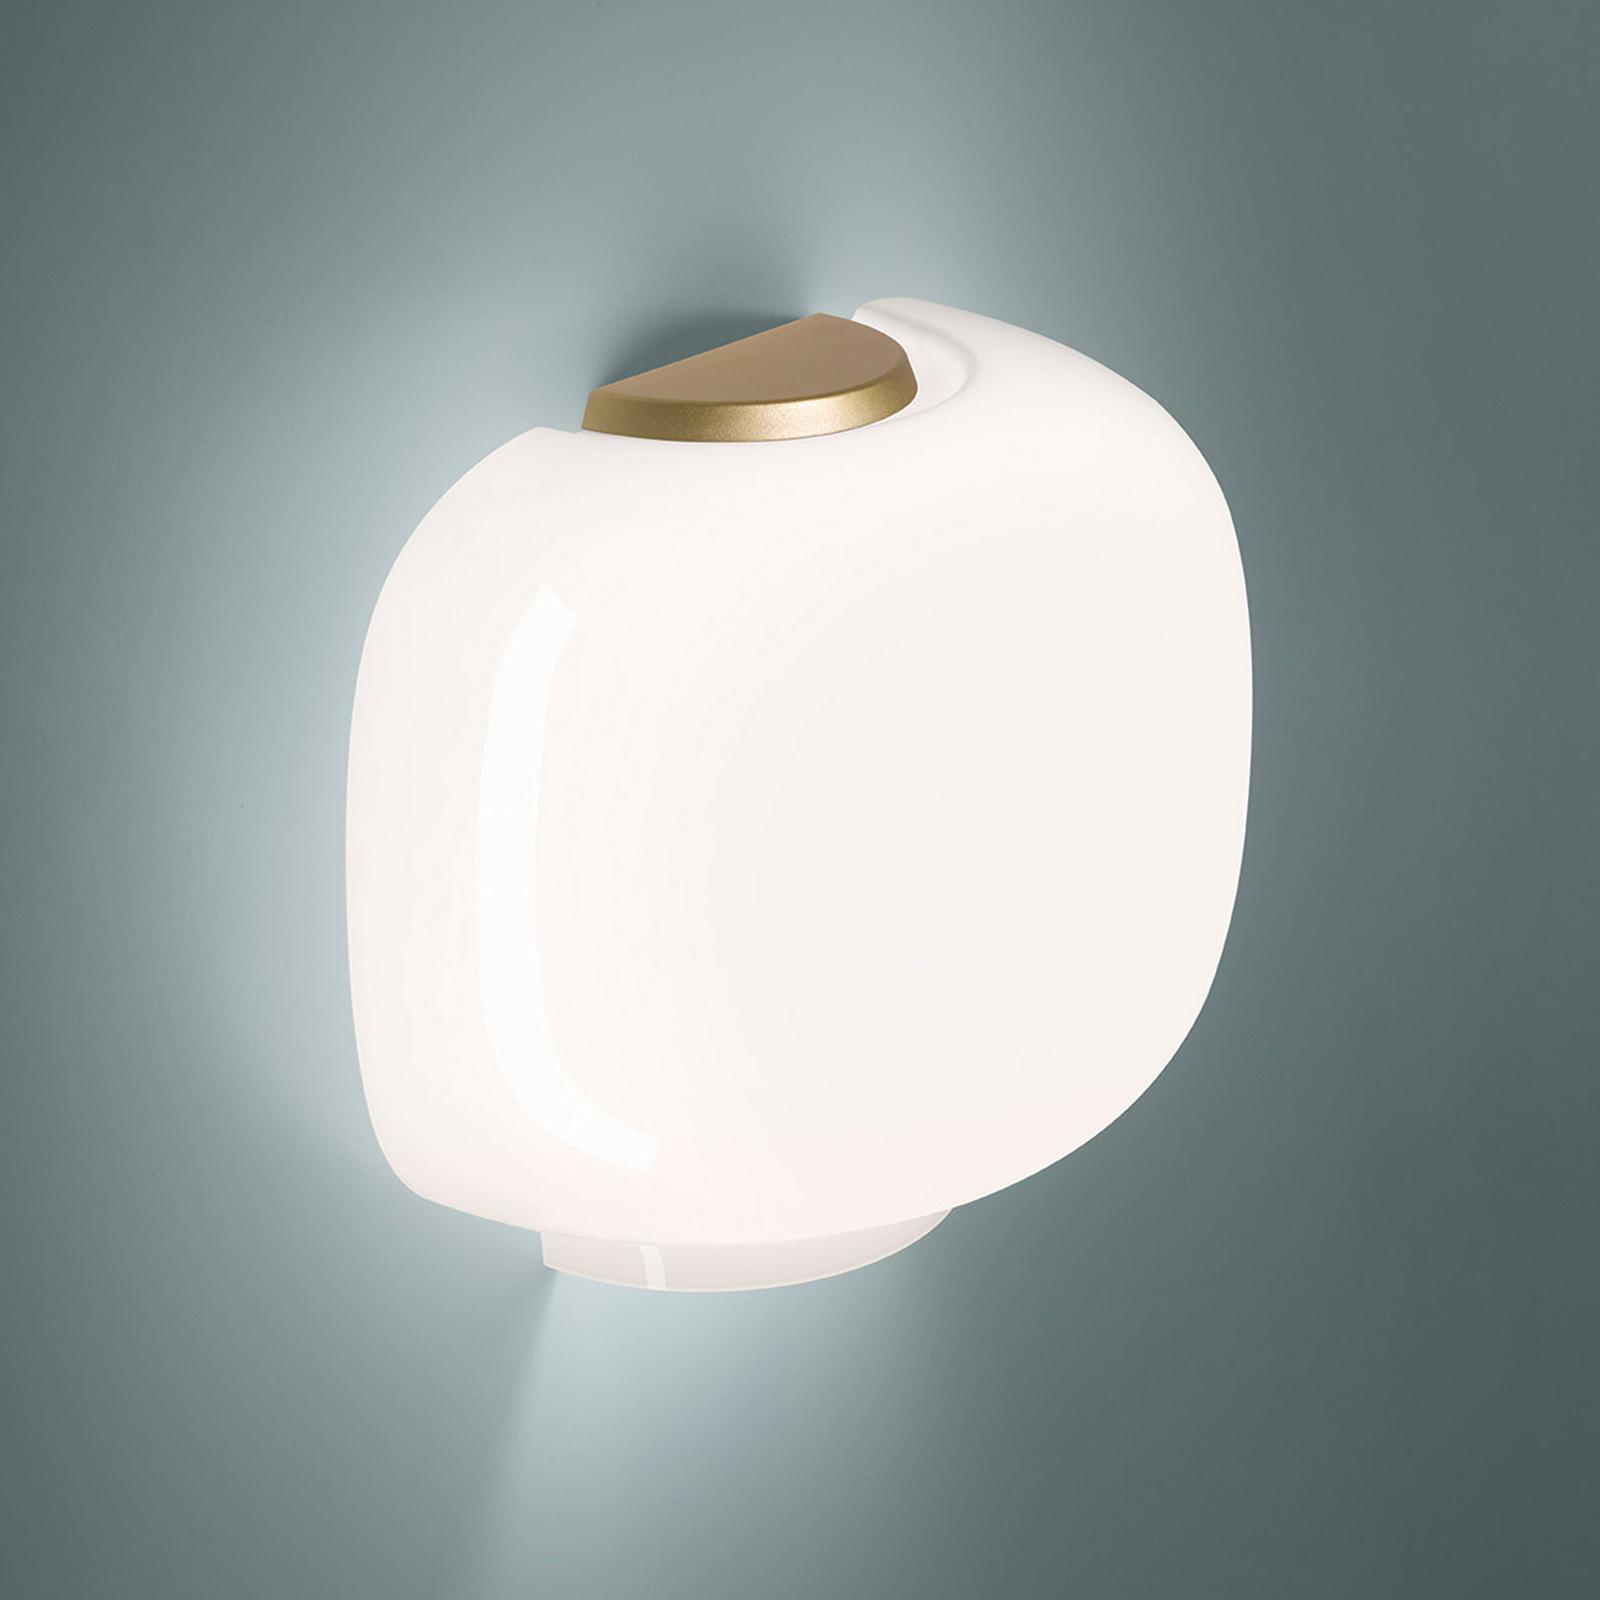 Foscarini Chouchin 3 Semi My Light weiß/gold